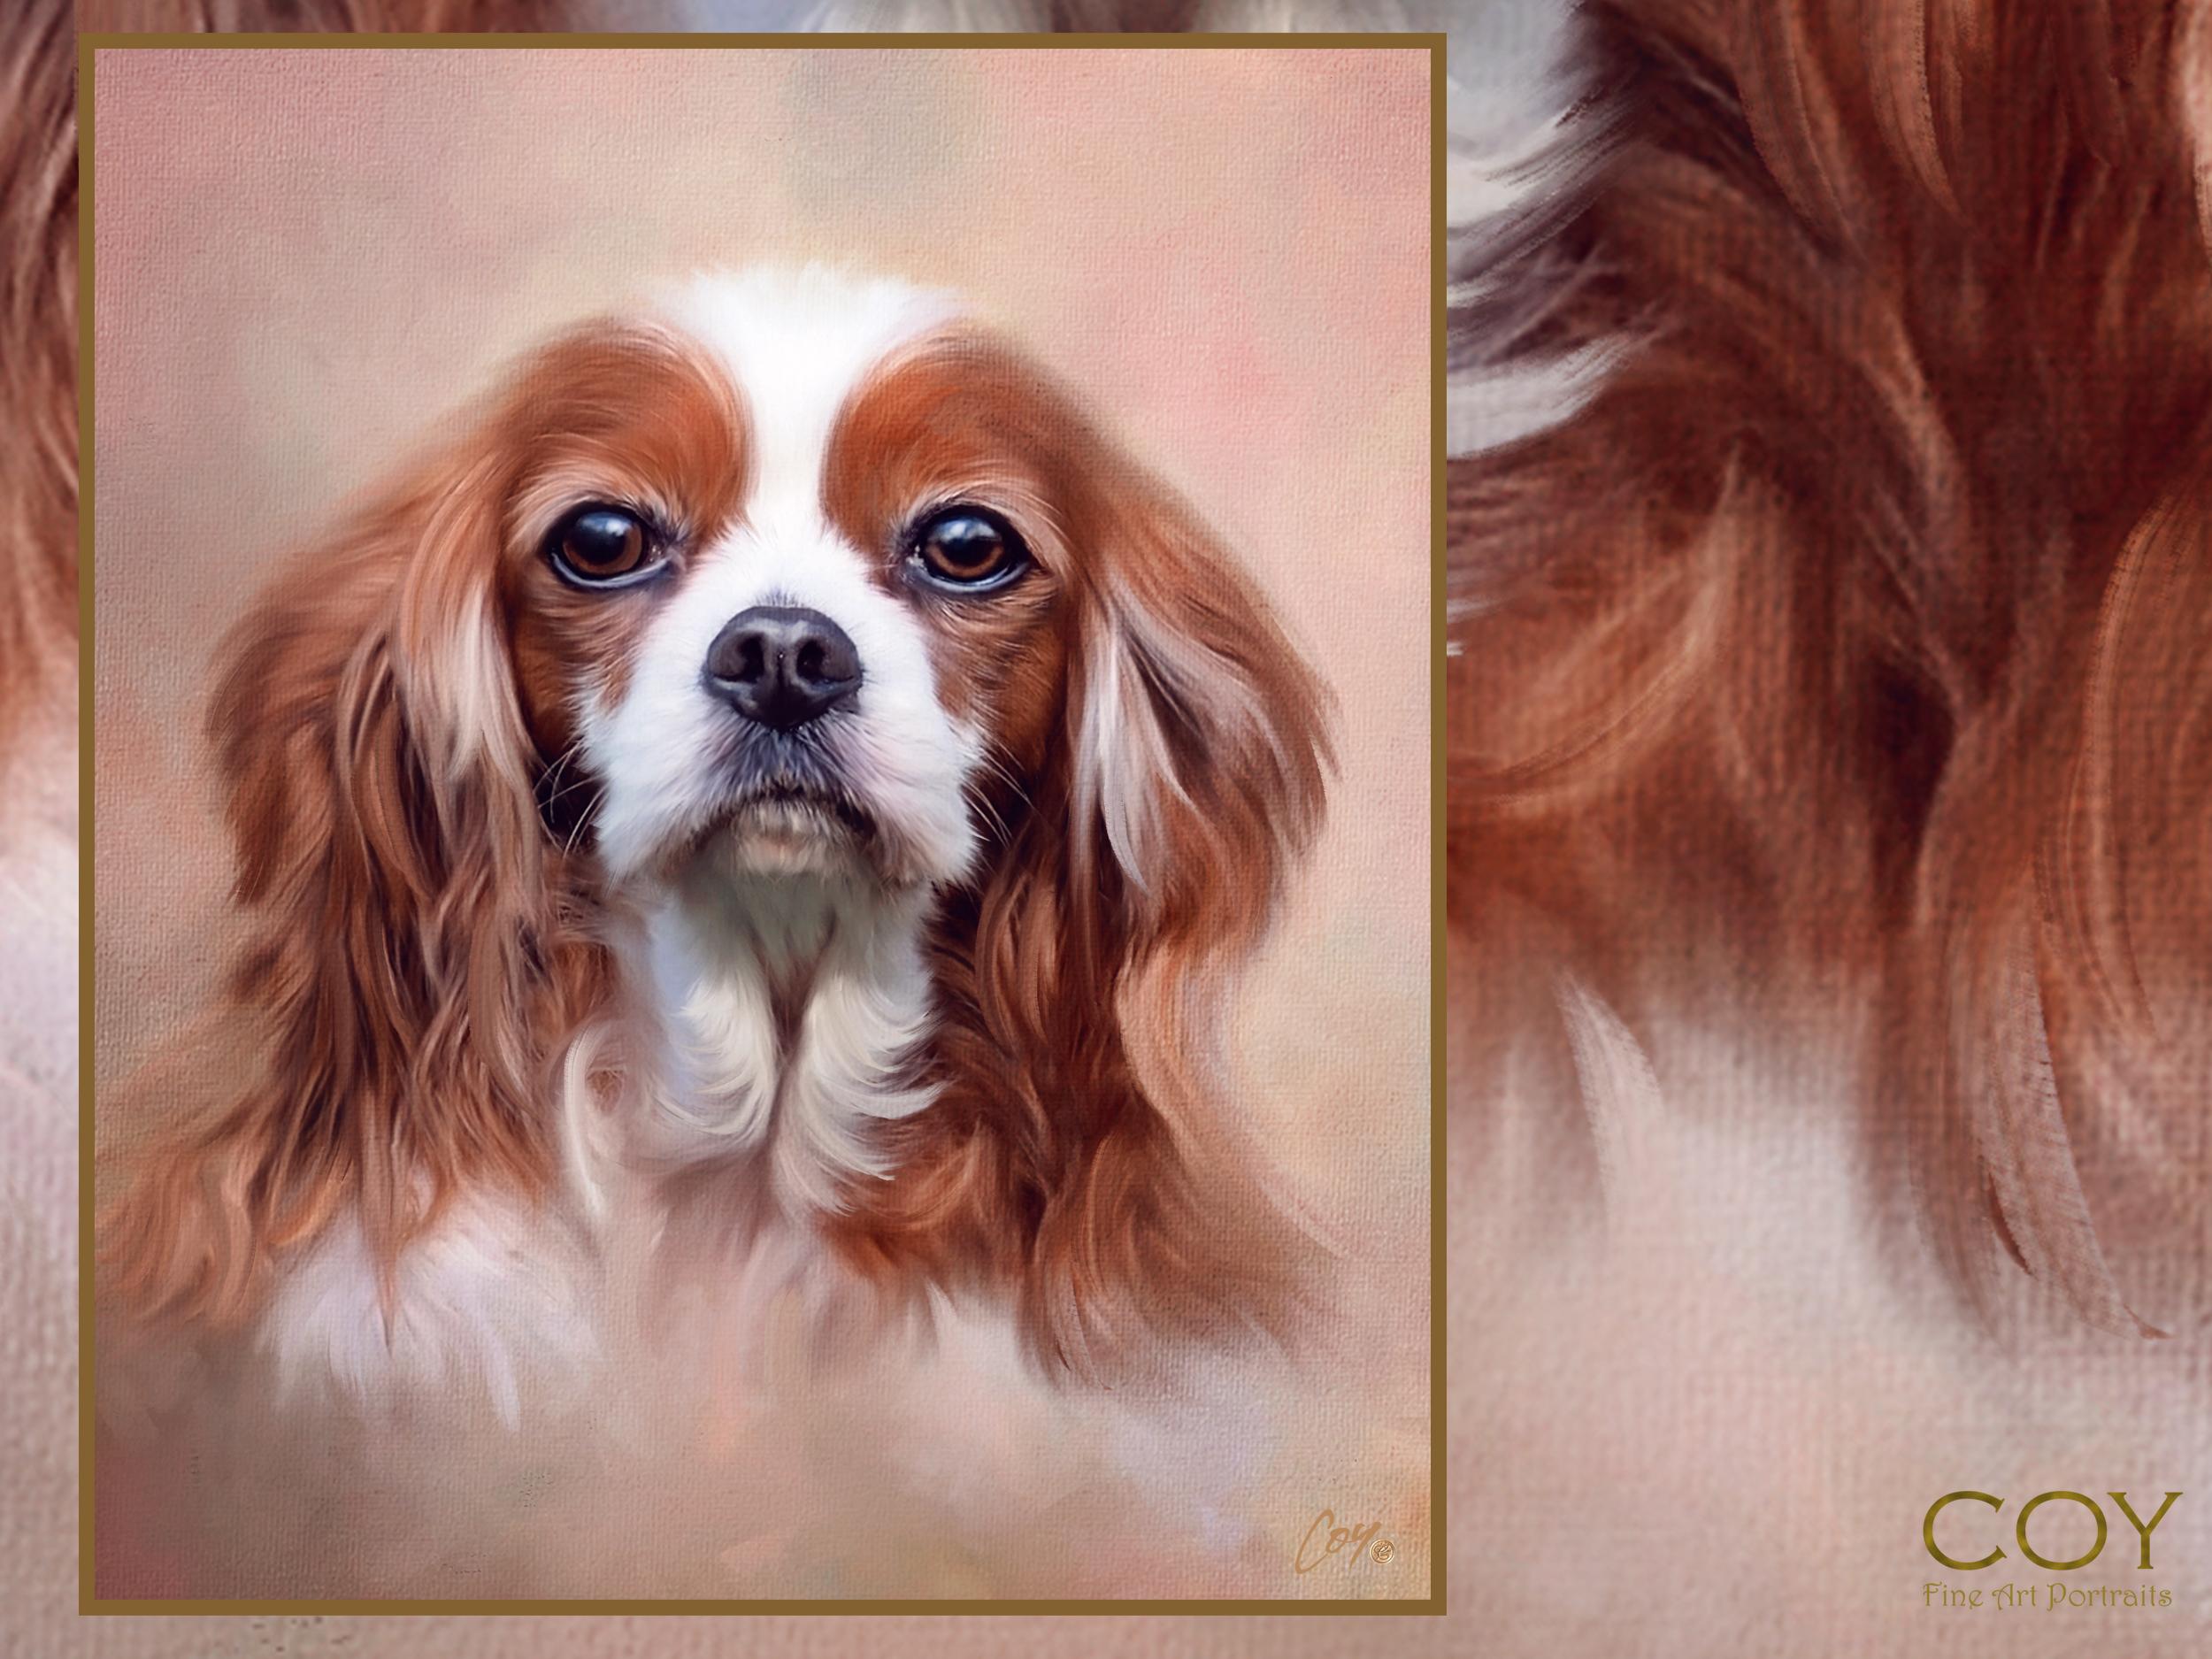 rancho santa fe-dog-pet-photographer-painting-cavalier-puppy-puppies-sale-terrier-fairbanks ranch.jpg